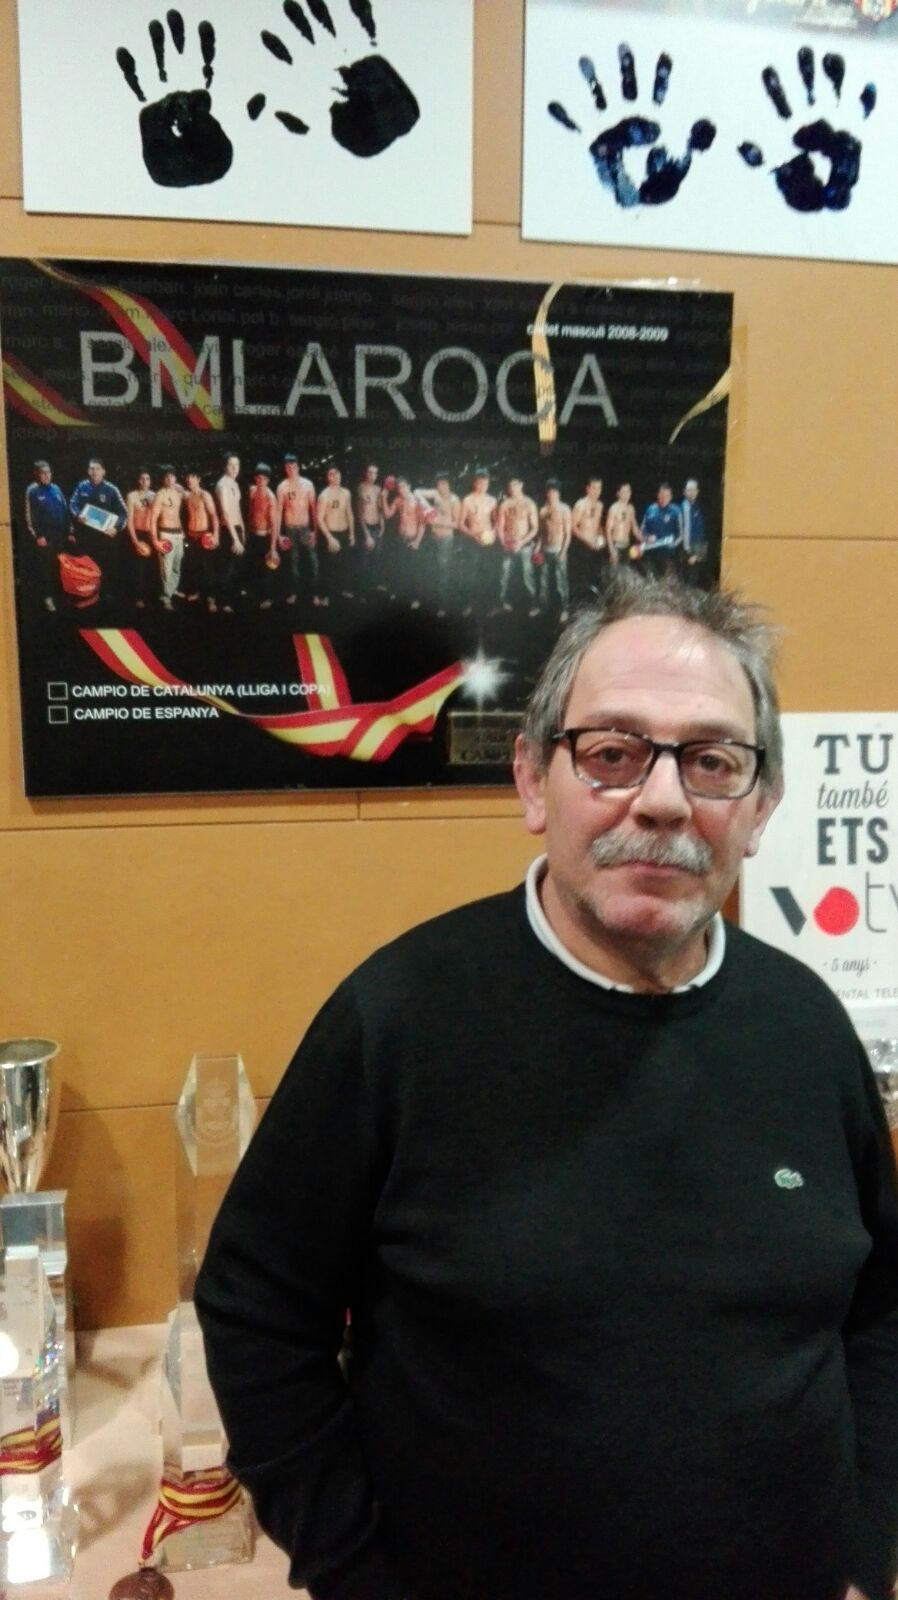 Jose Luis Grande